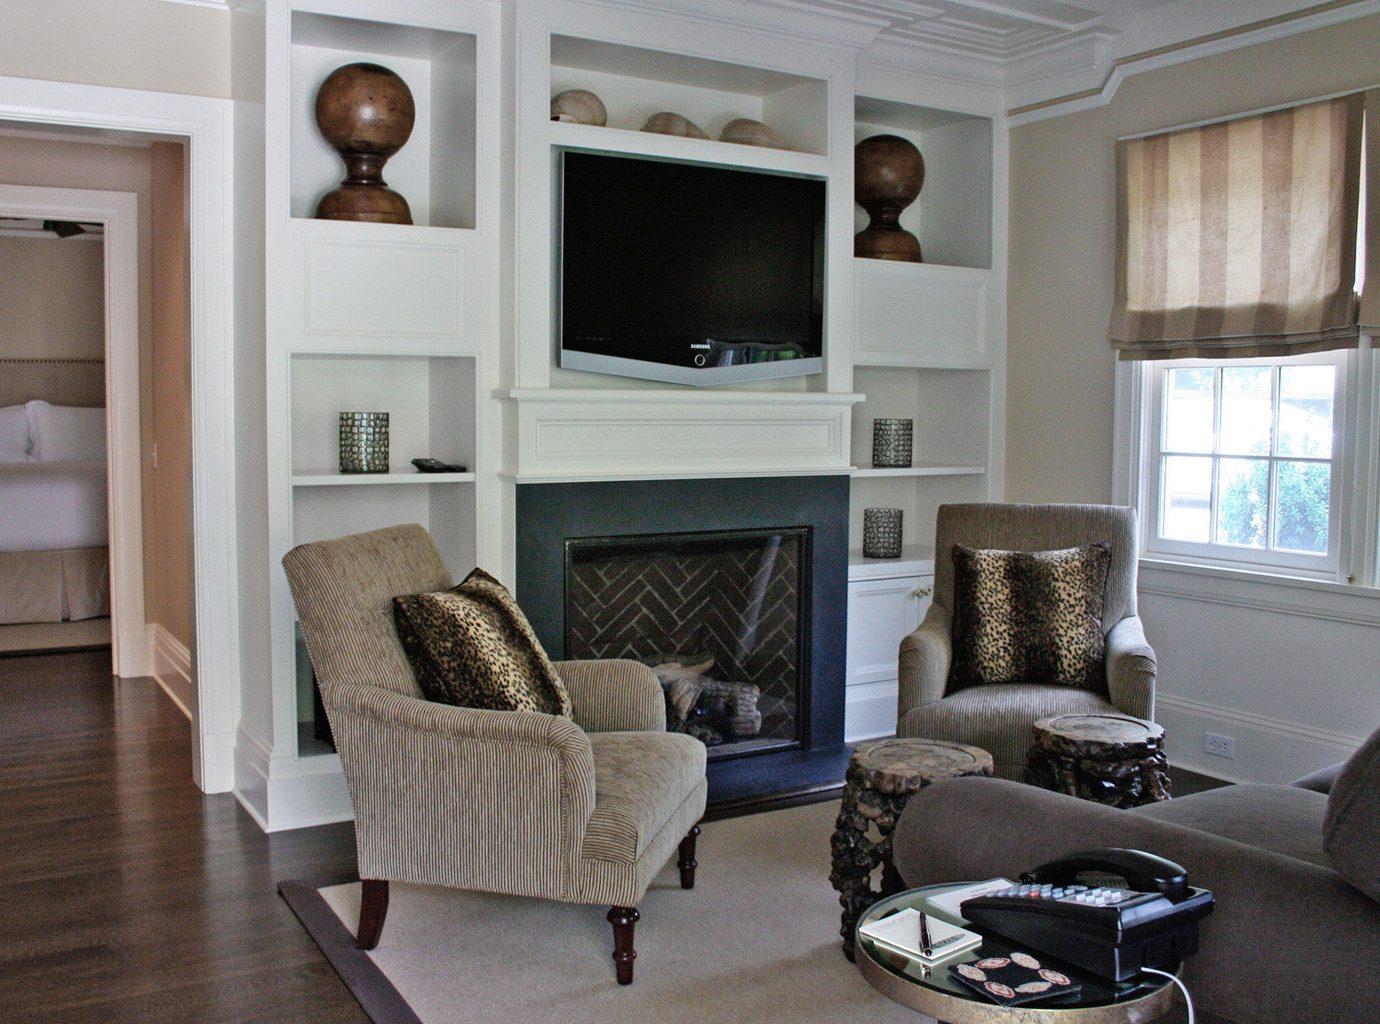 Beach Boutique Fireplace Inn Romance Romantic living room property home hardwood cottage condominium flooring